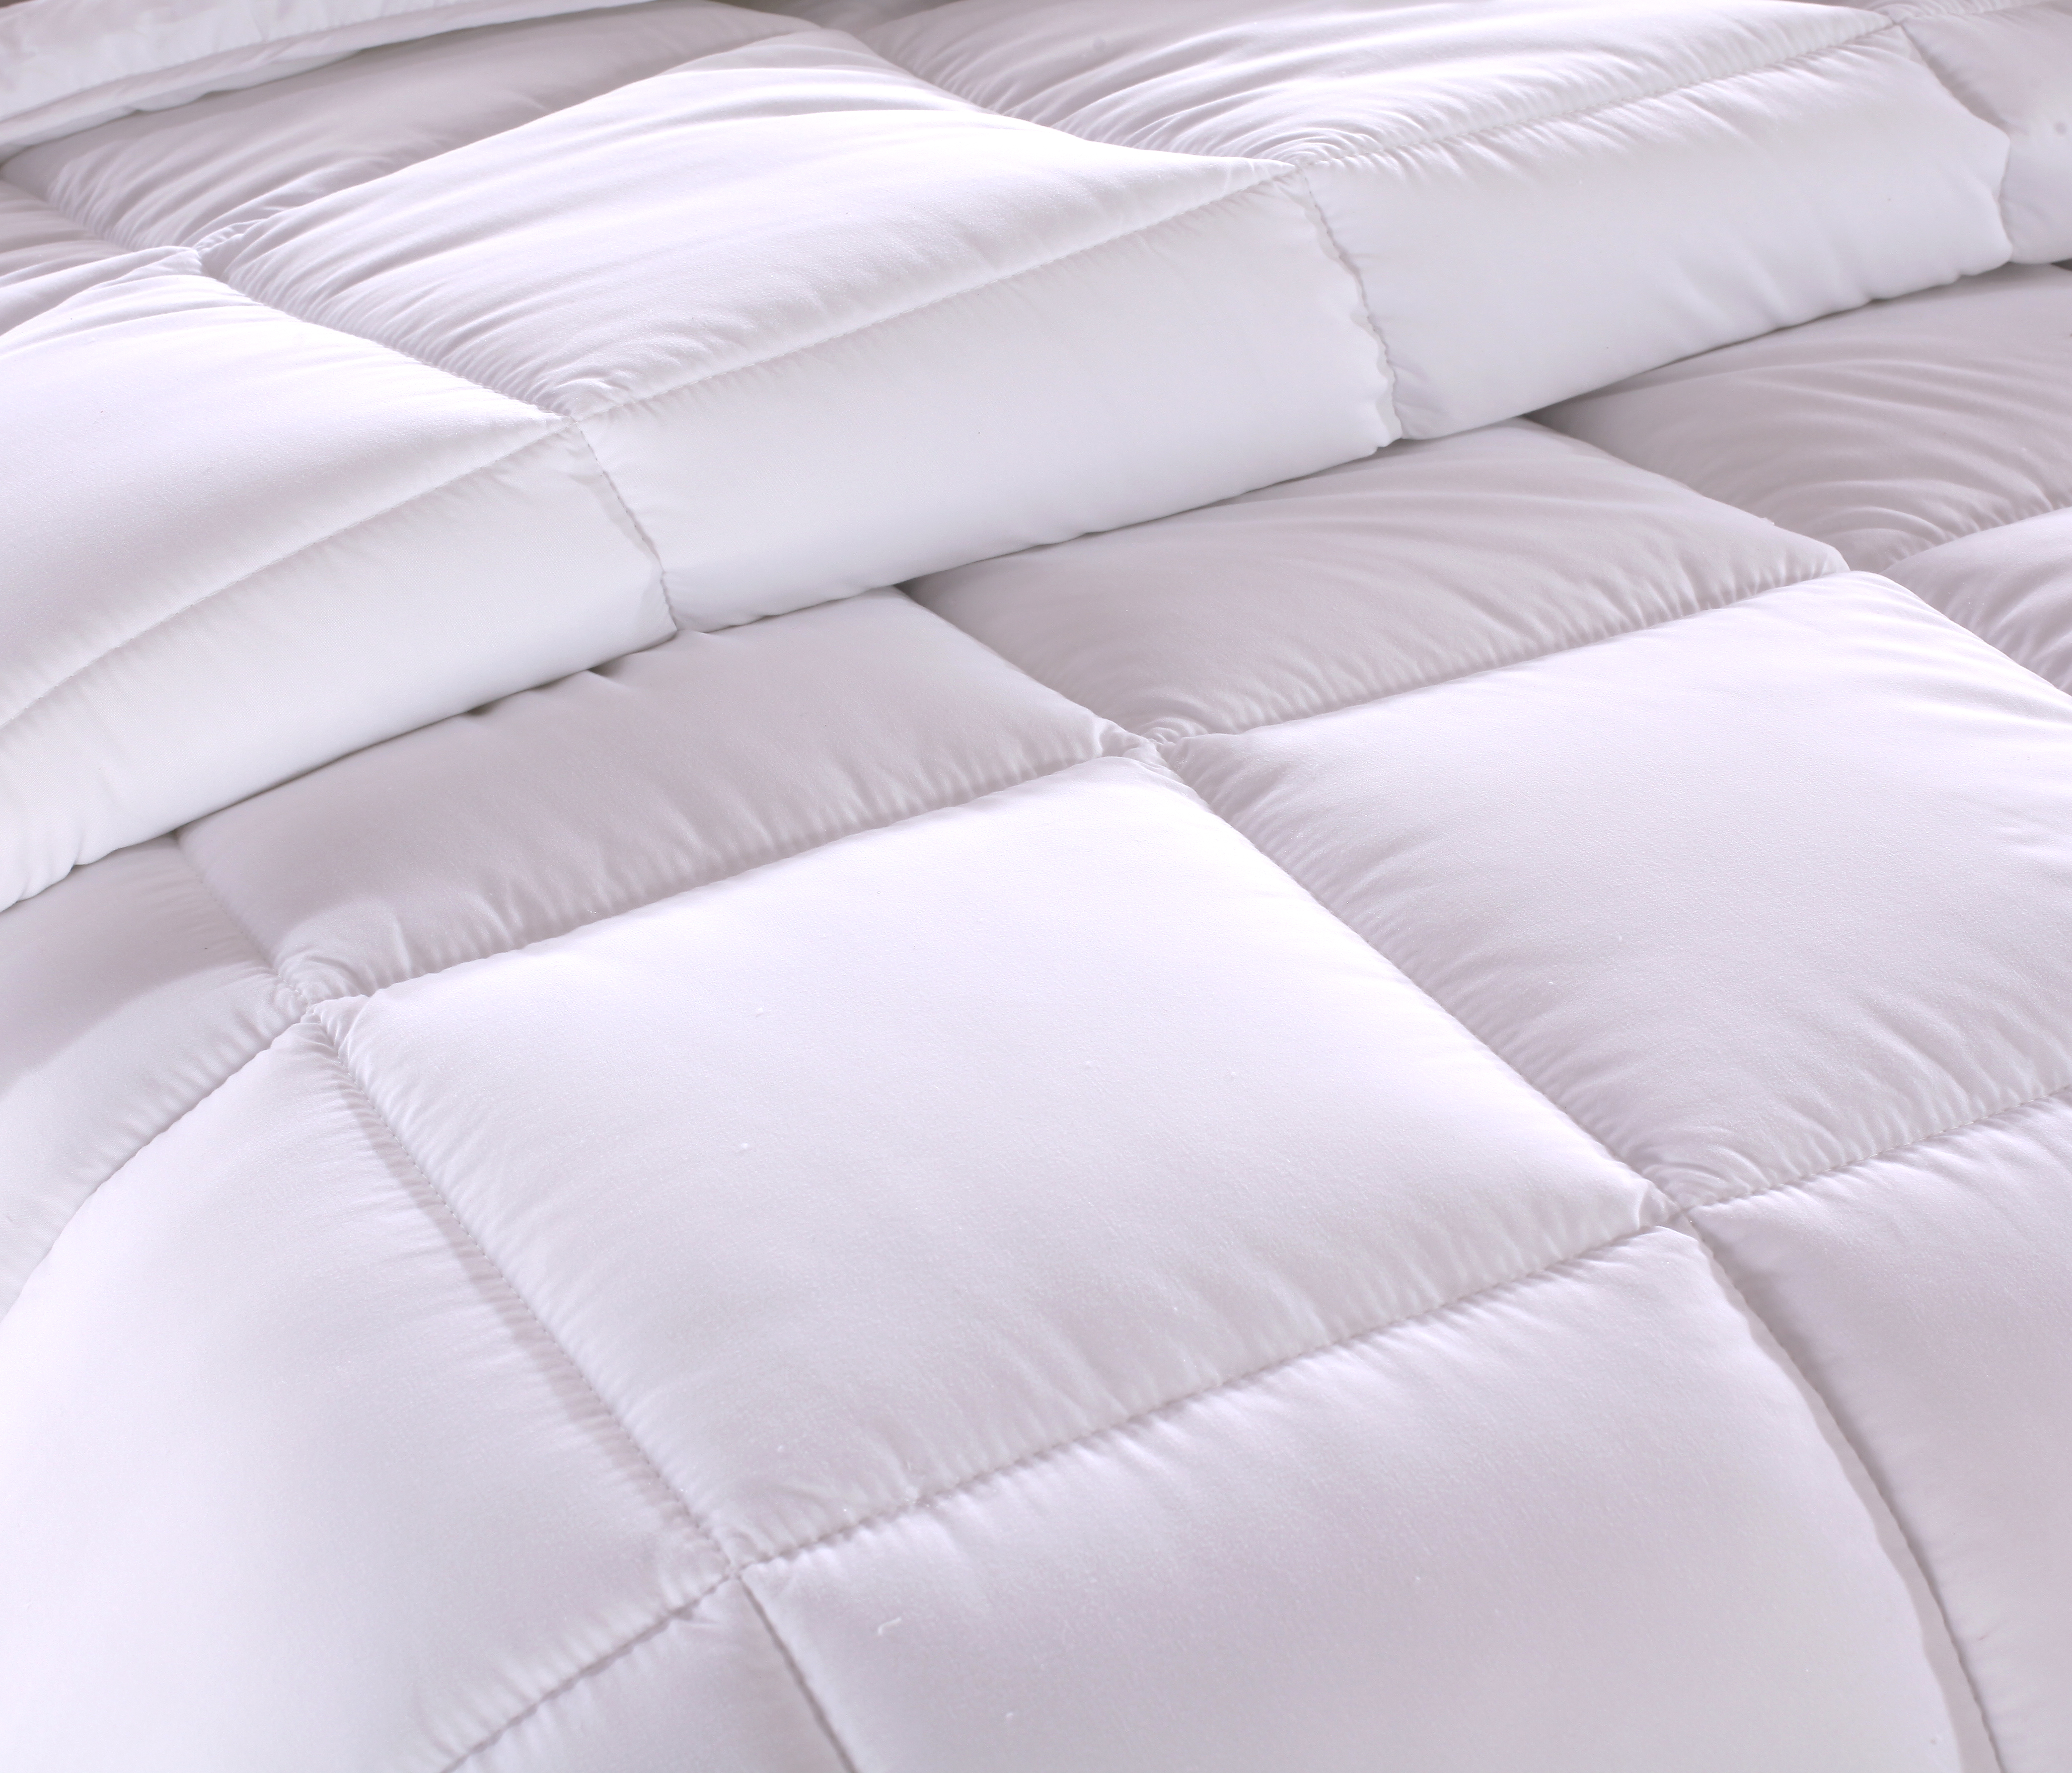 reversible alwyn all duvet down insert comforter bed alternative shell reviews season home wayfair bath microfiber pdx